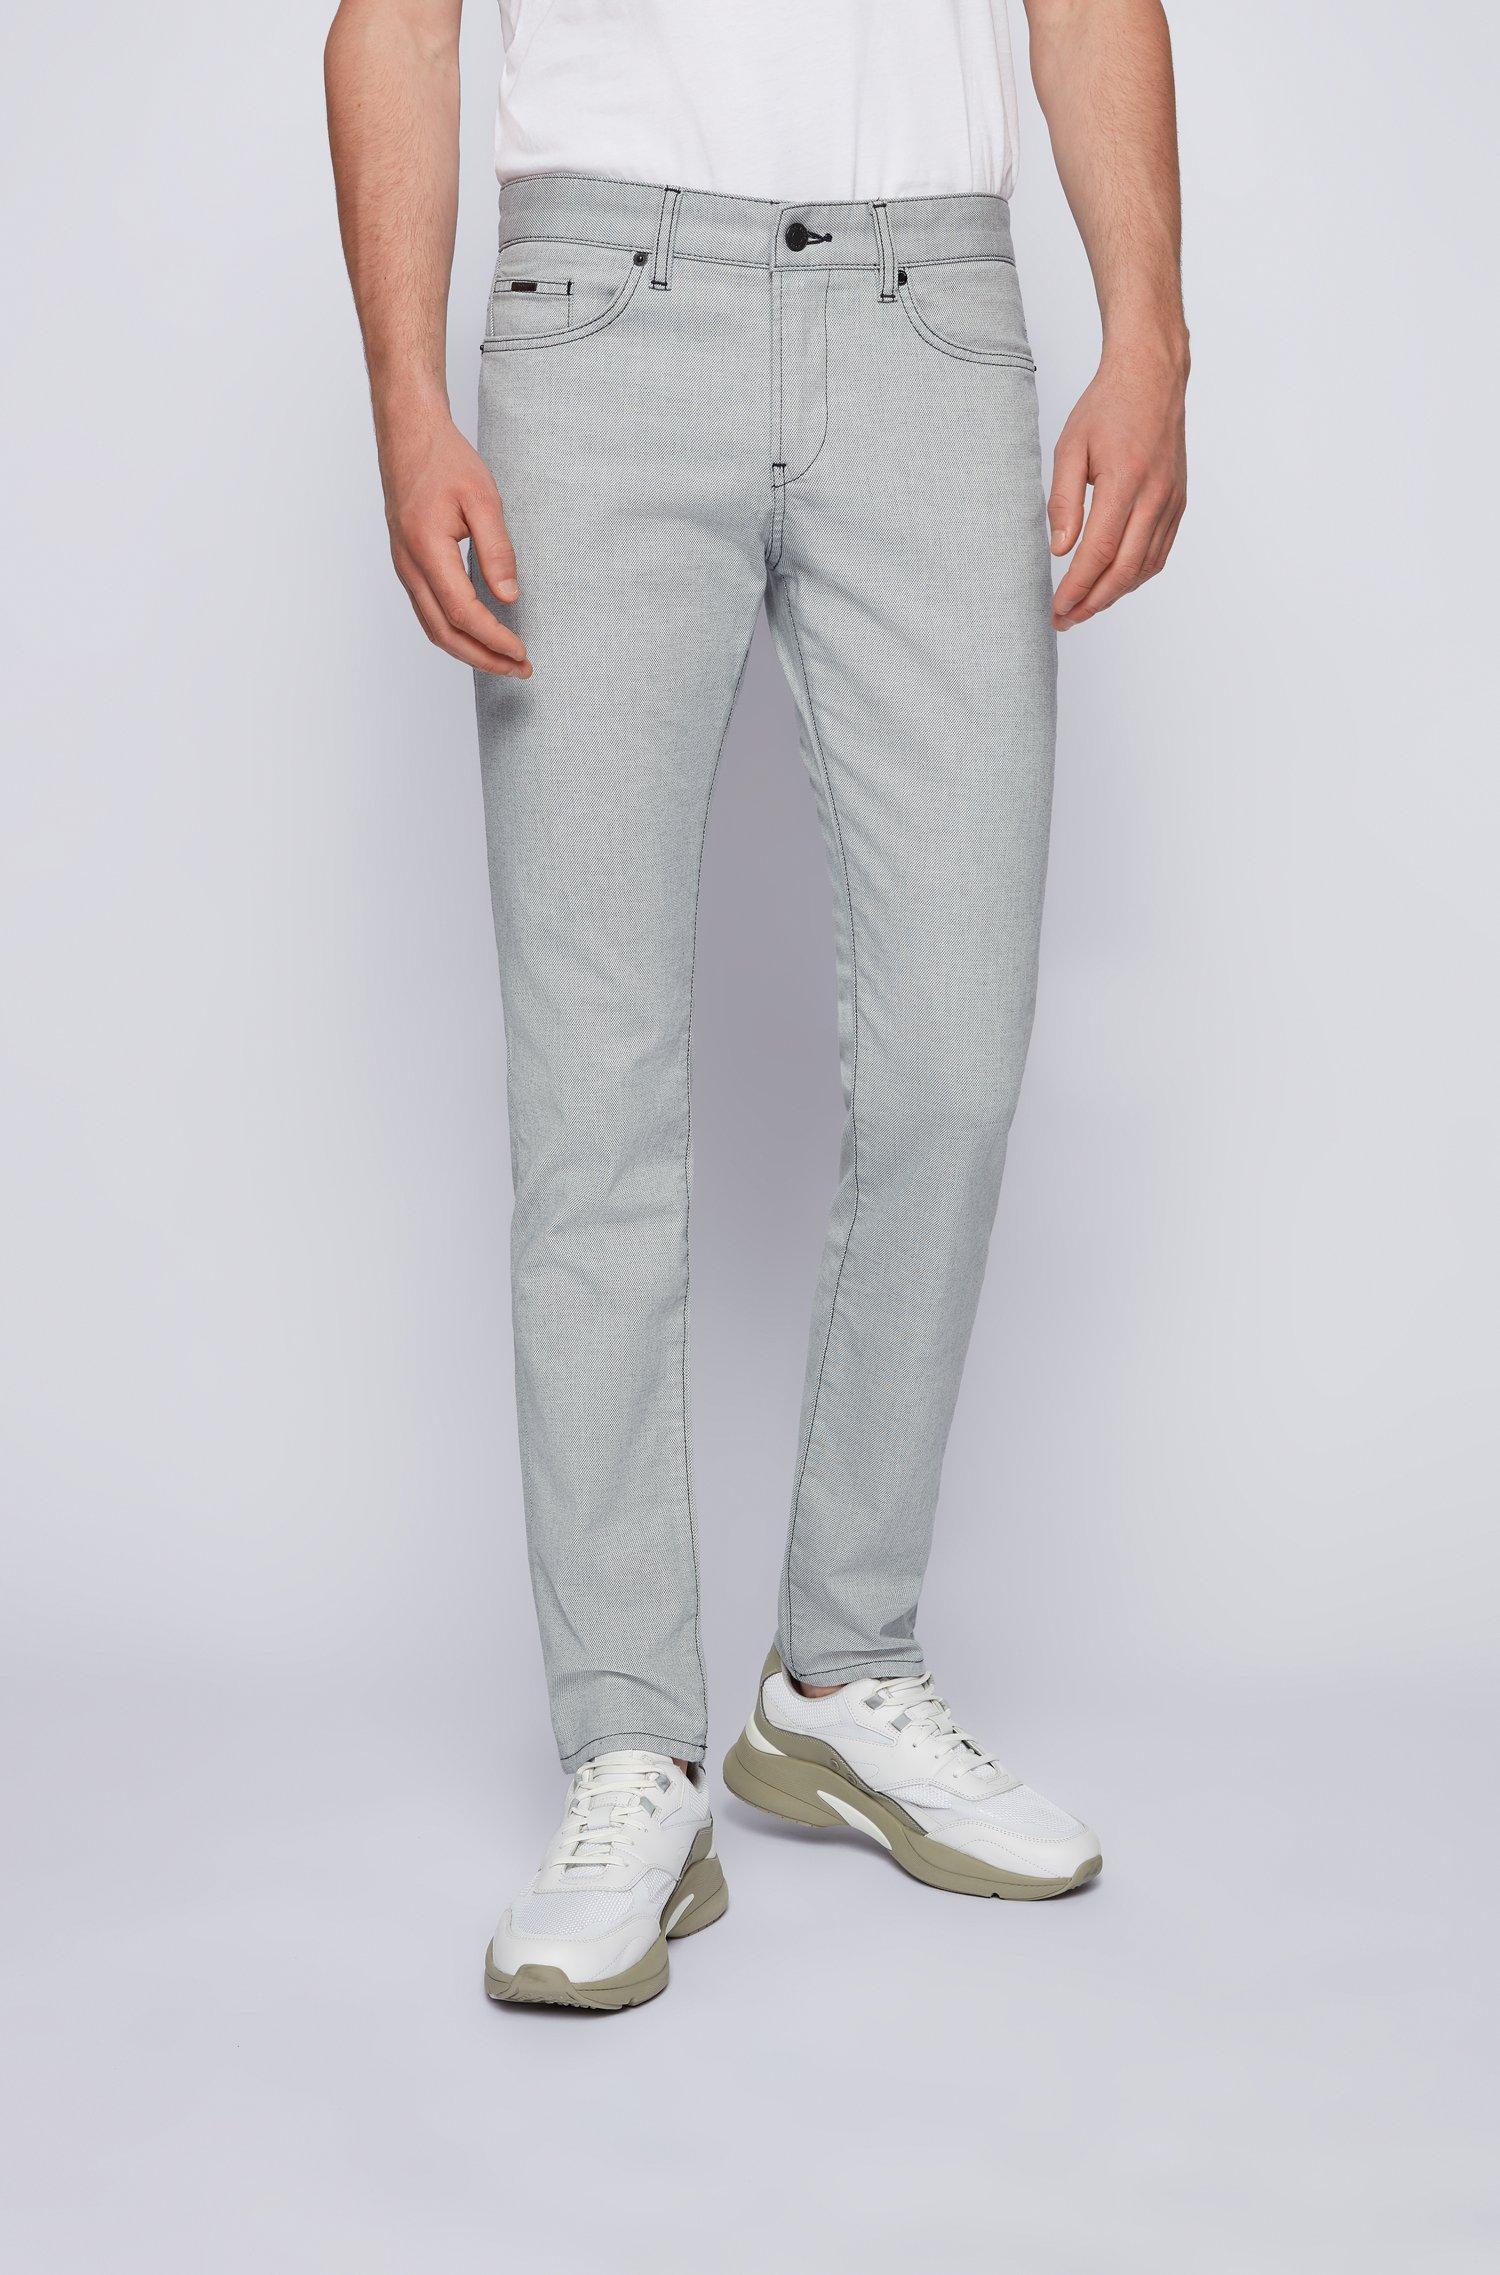 Slim-Fit Jeans aus strukturiertem Stretch-Denim, Hellgrau